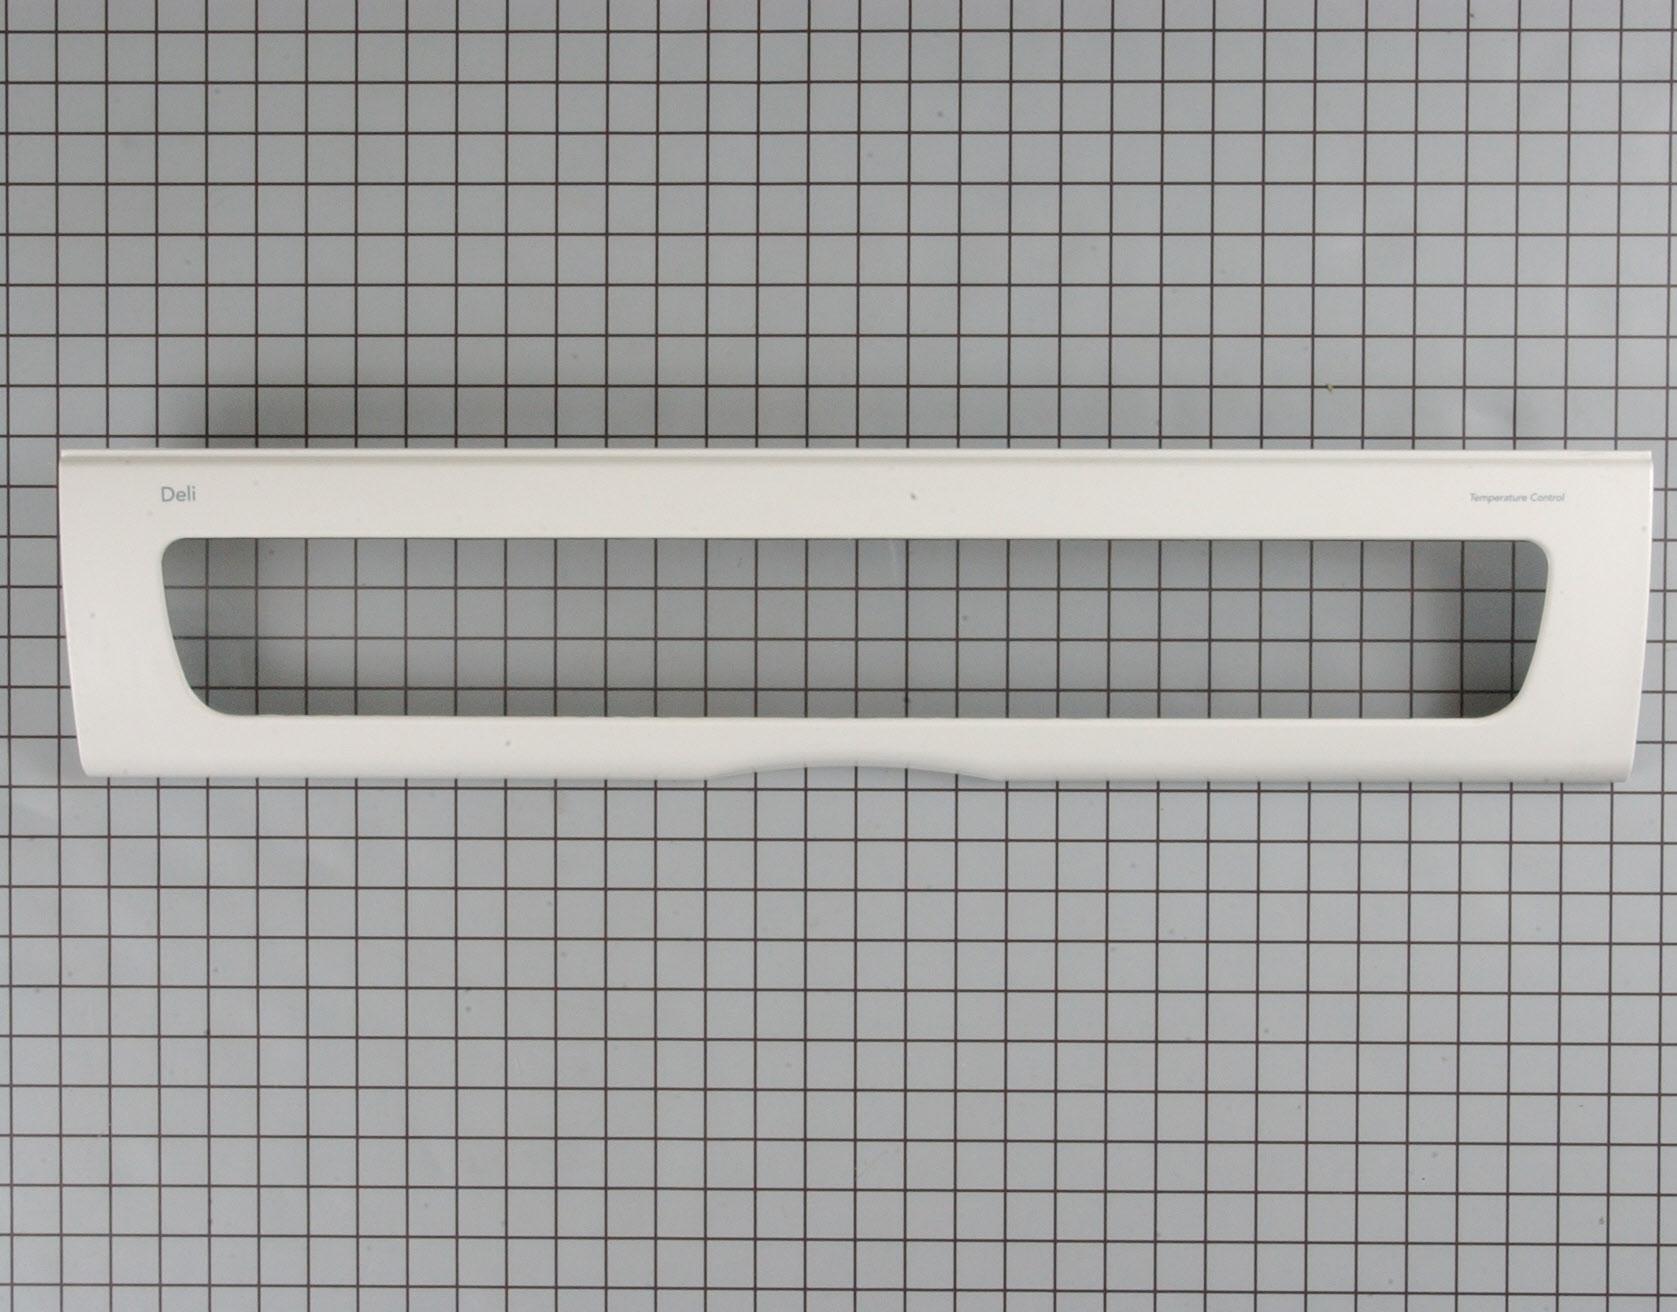 WP67005930 KitchenAid Refrigerator Part -Drawer Front